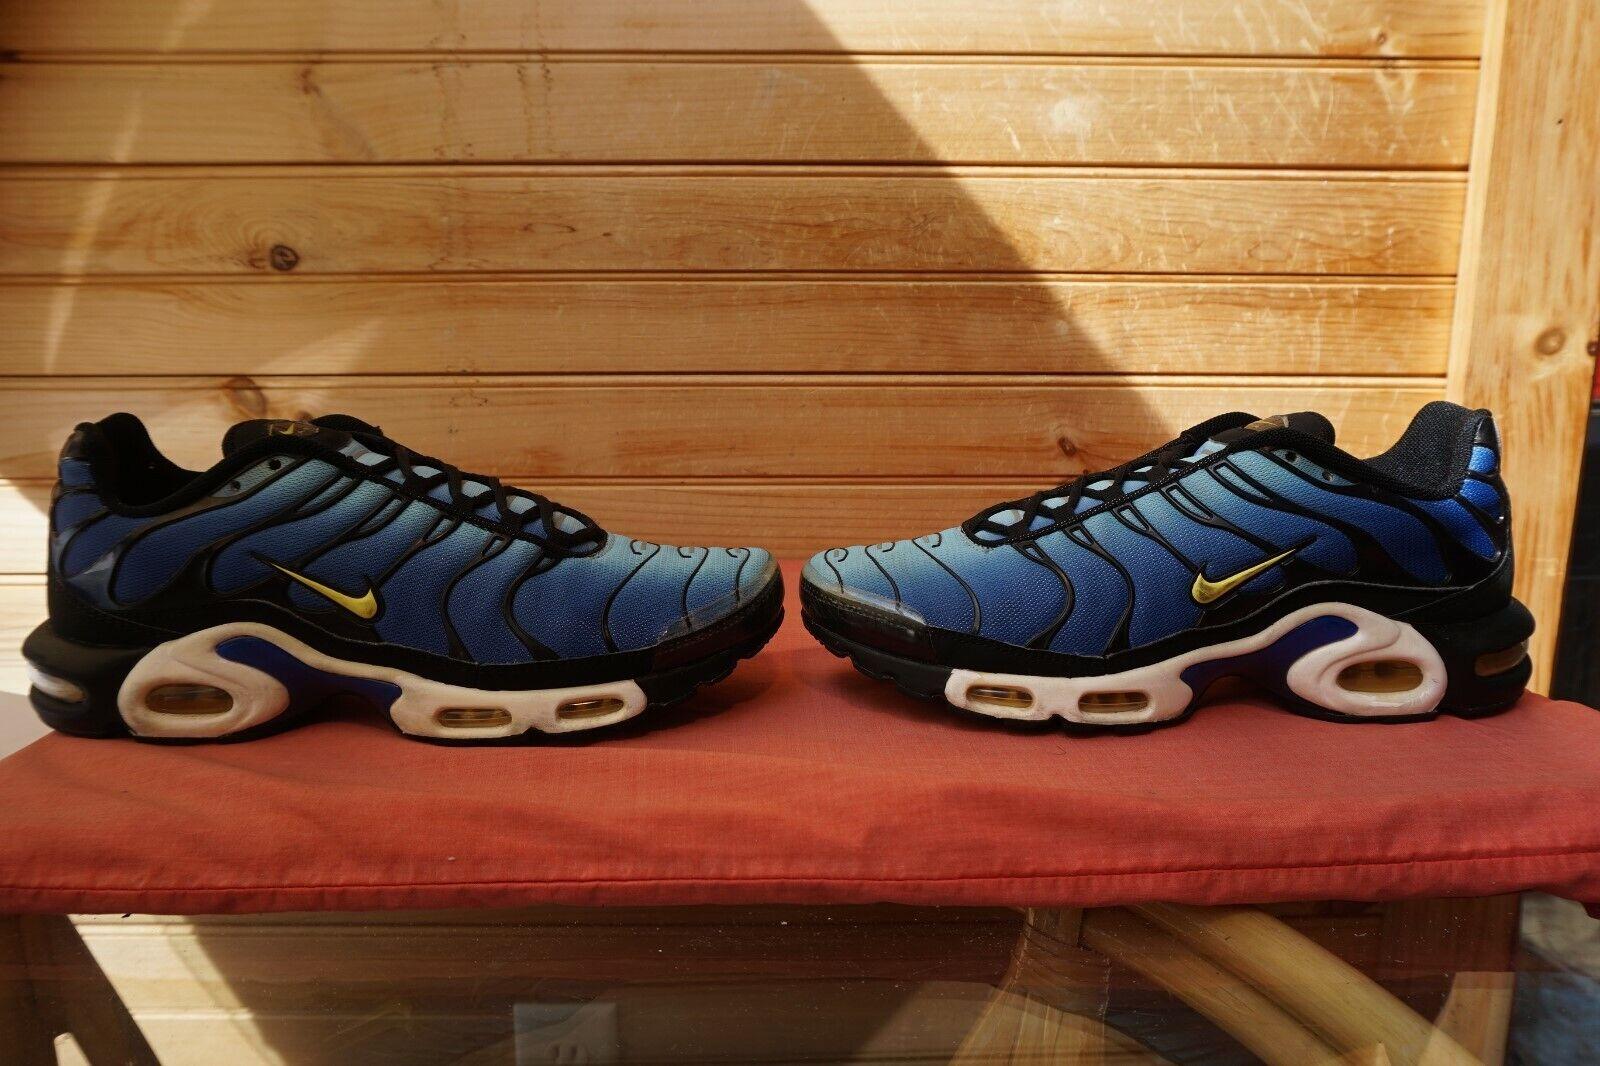 2013 Nike Air Max Plus  Hyper bluee Chamois Sky bluee  Sz 11 (L147) 604133-475